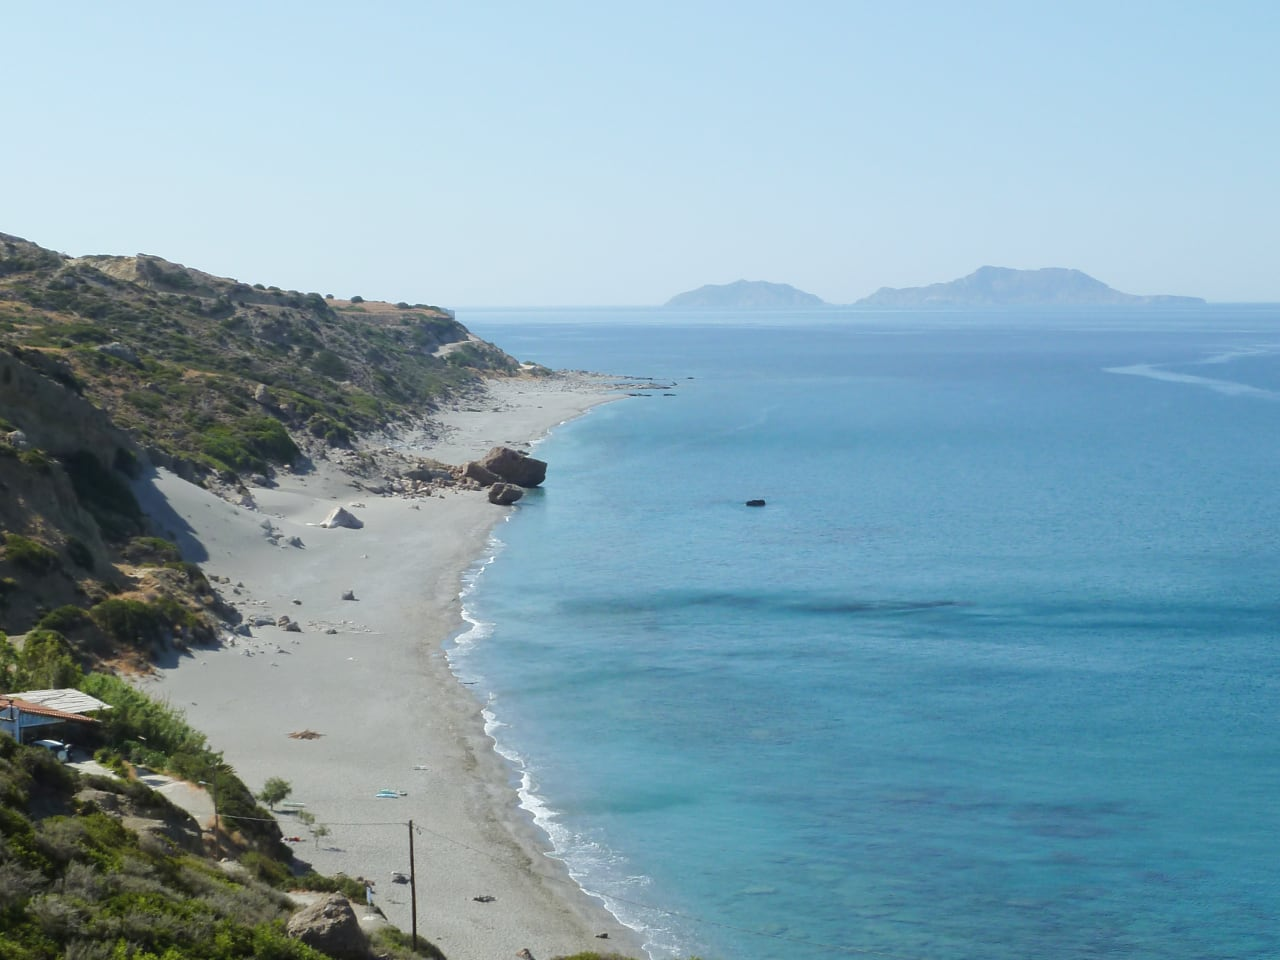 Photo Of The Day - Ligres Beach - South Rethimno, Crete